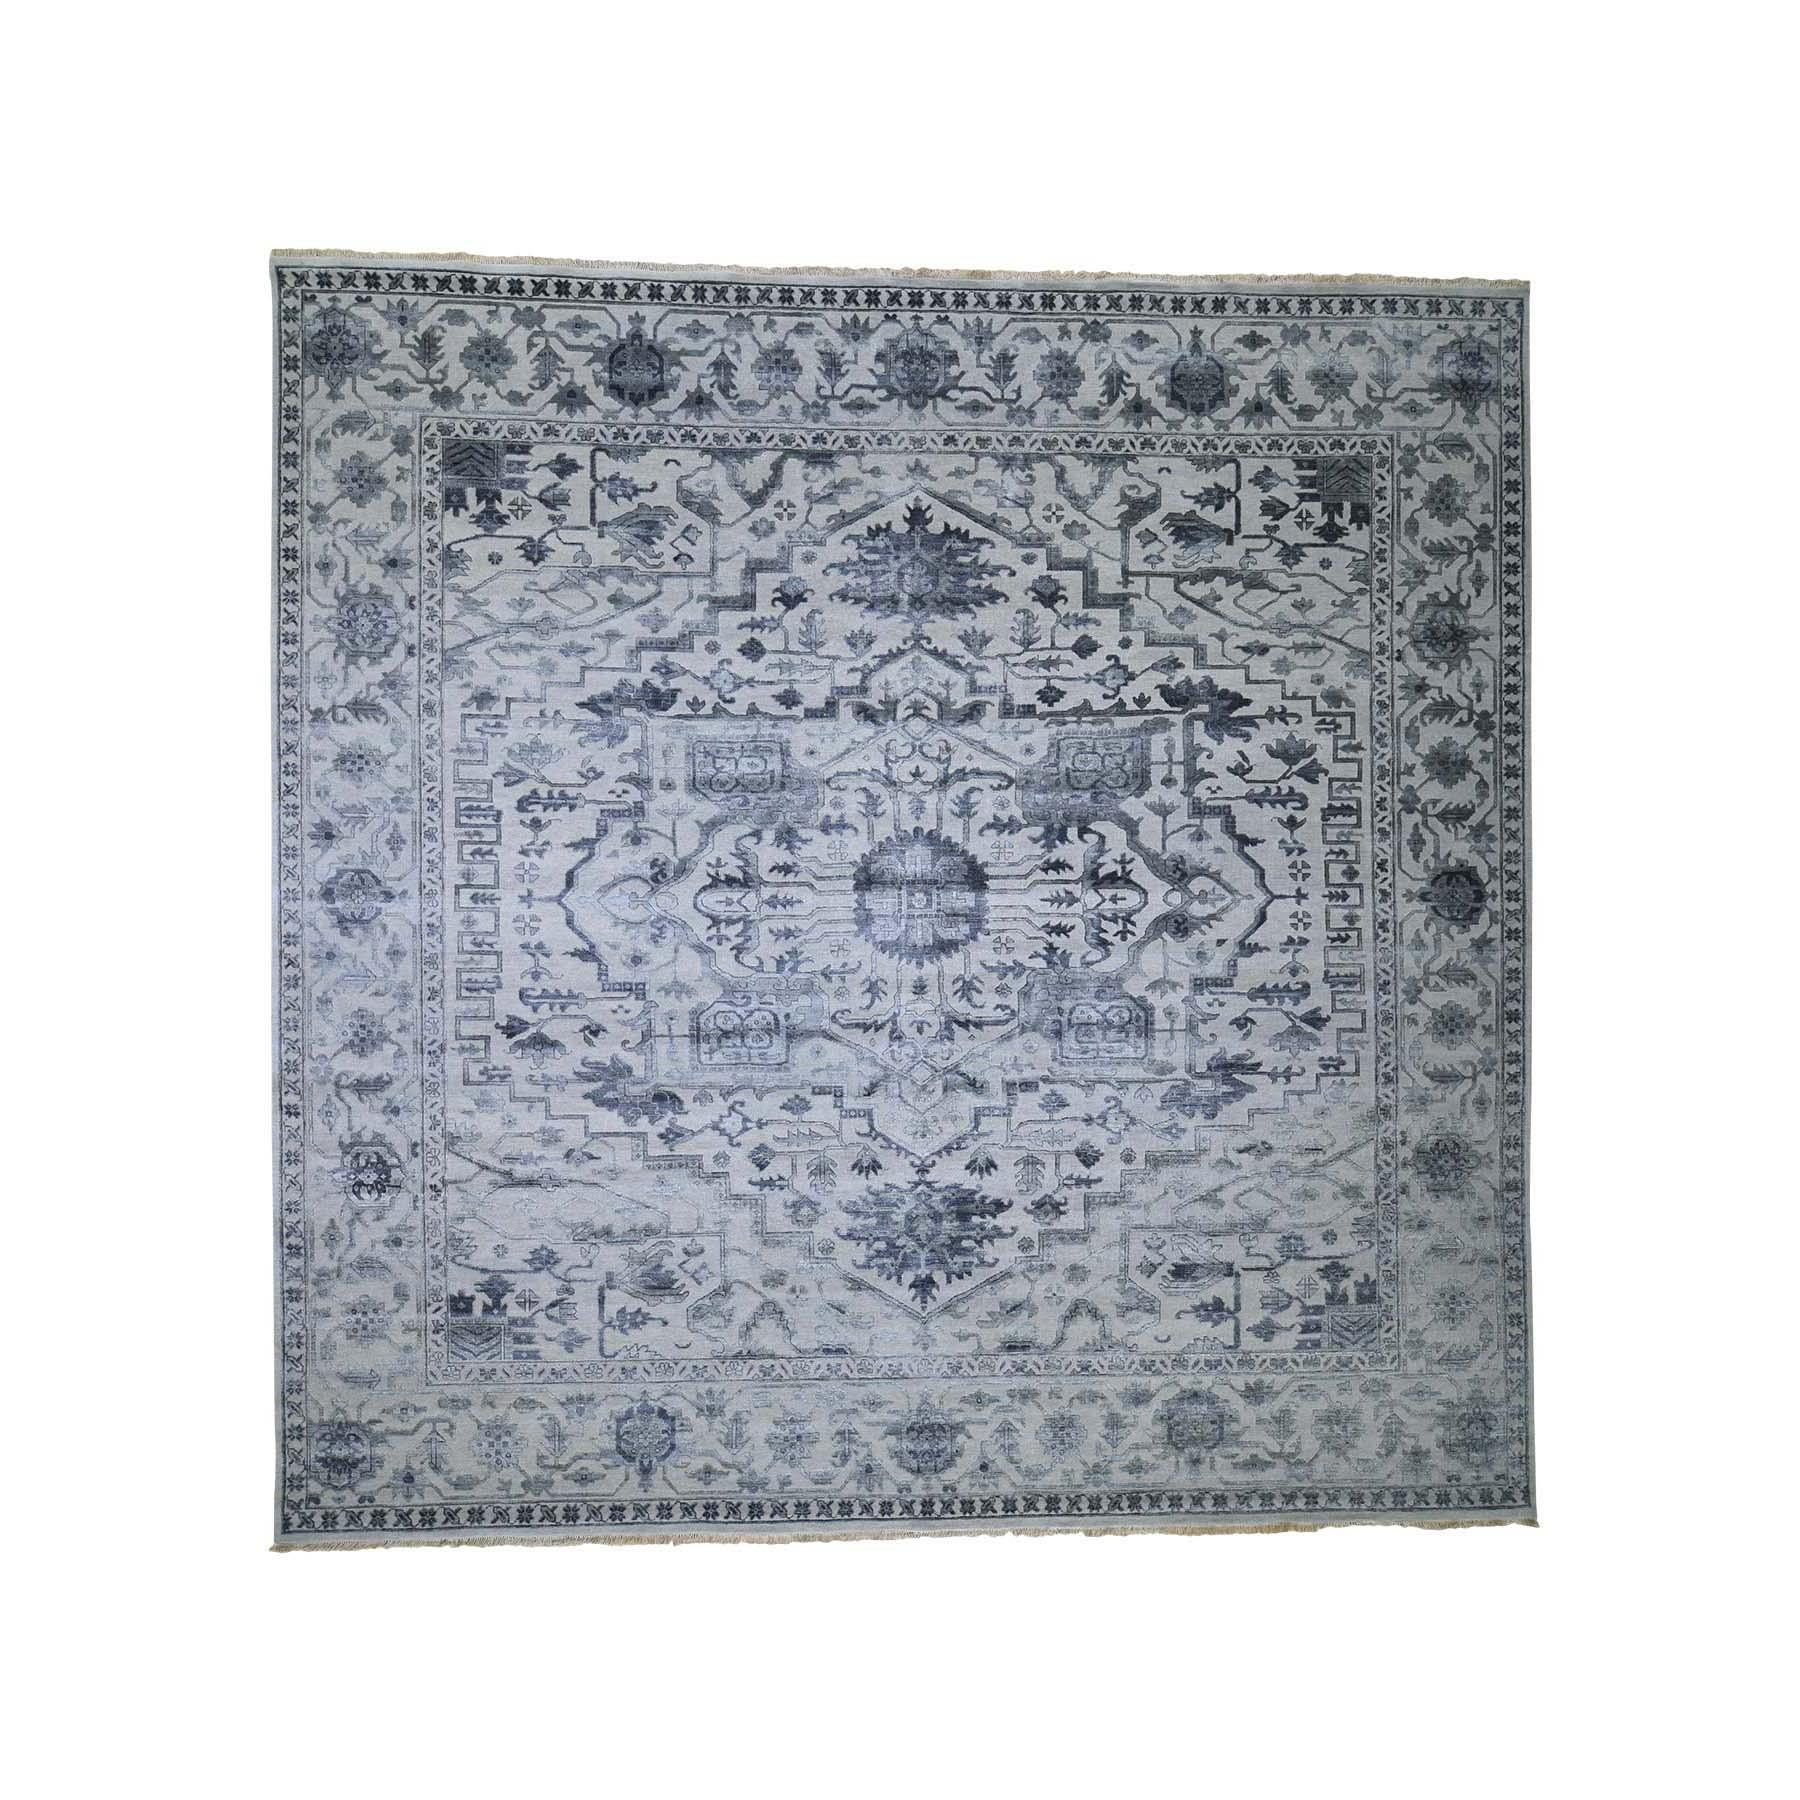 Serapi Heriz and Bakhshayesh Collection Hand Knotted Grey Rug No: 0189830